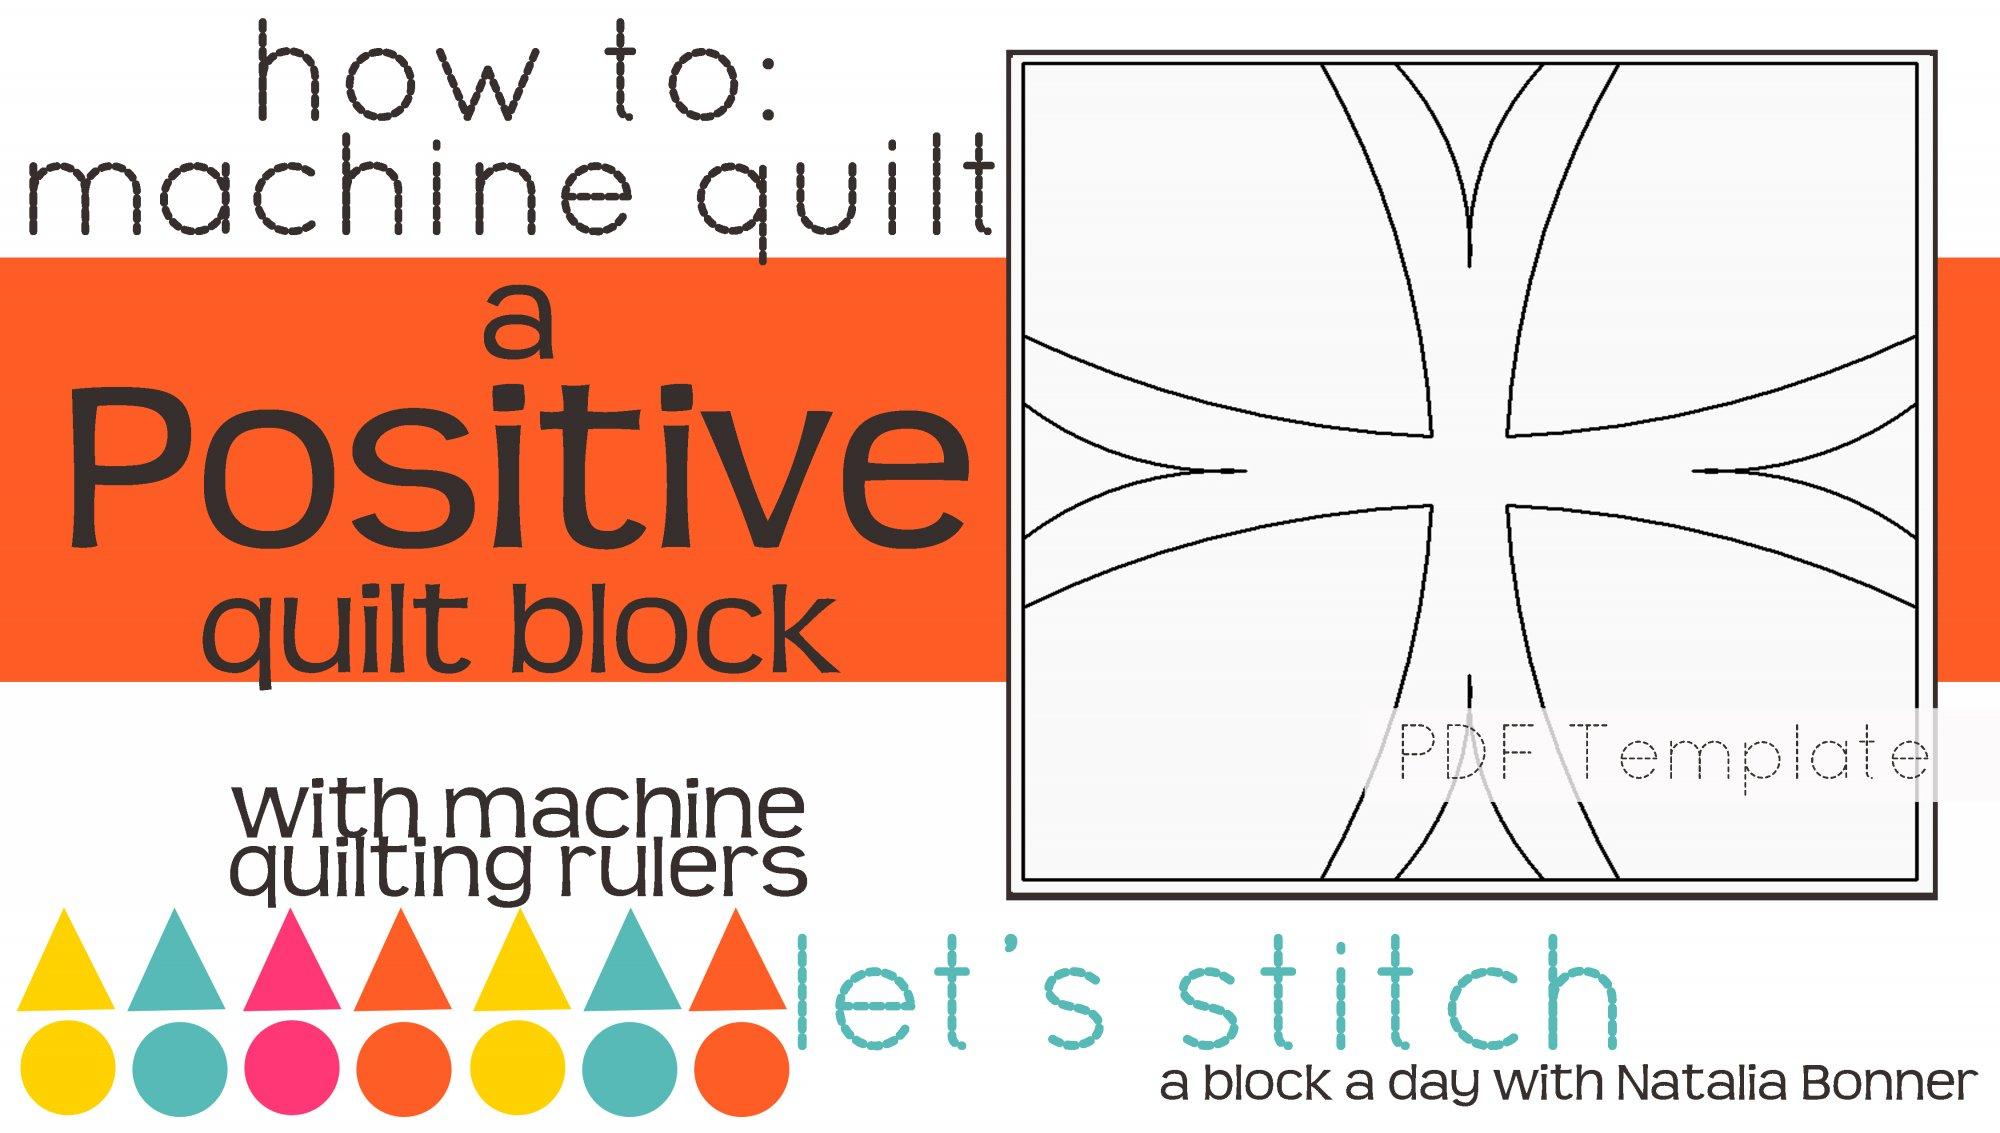 Let's Stitch - A Block a Day With Natalia Bonner - PDF - Positive